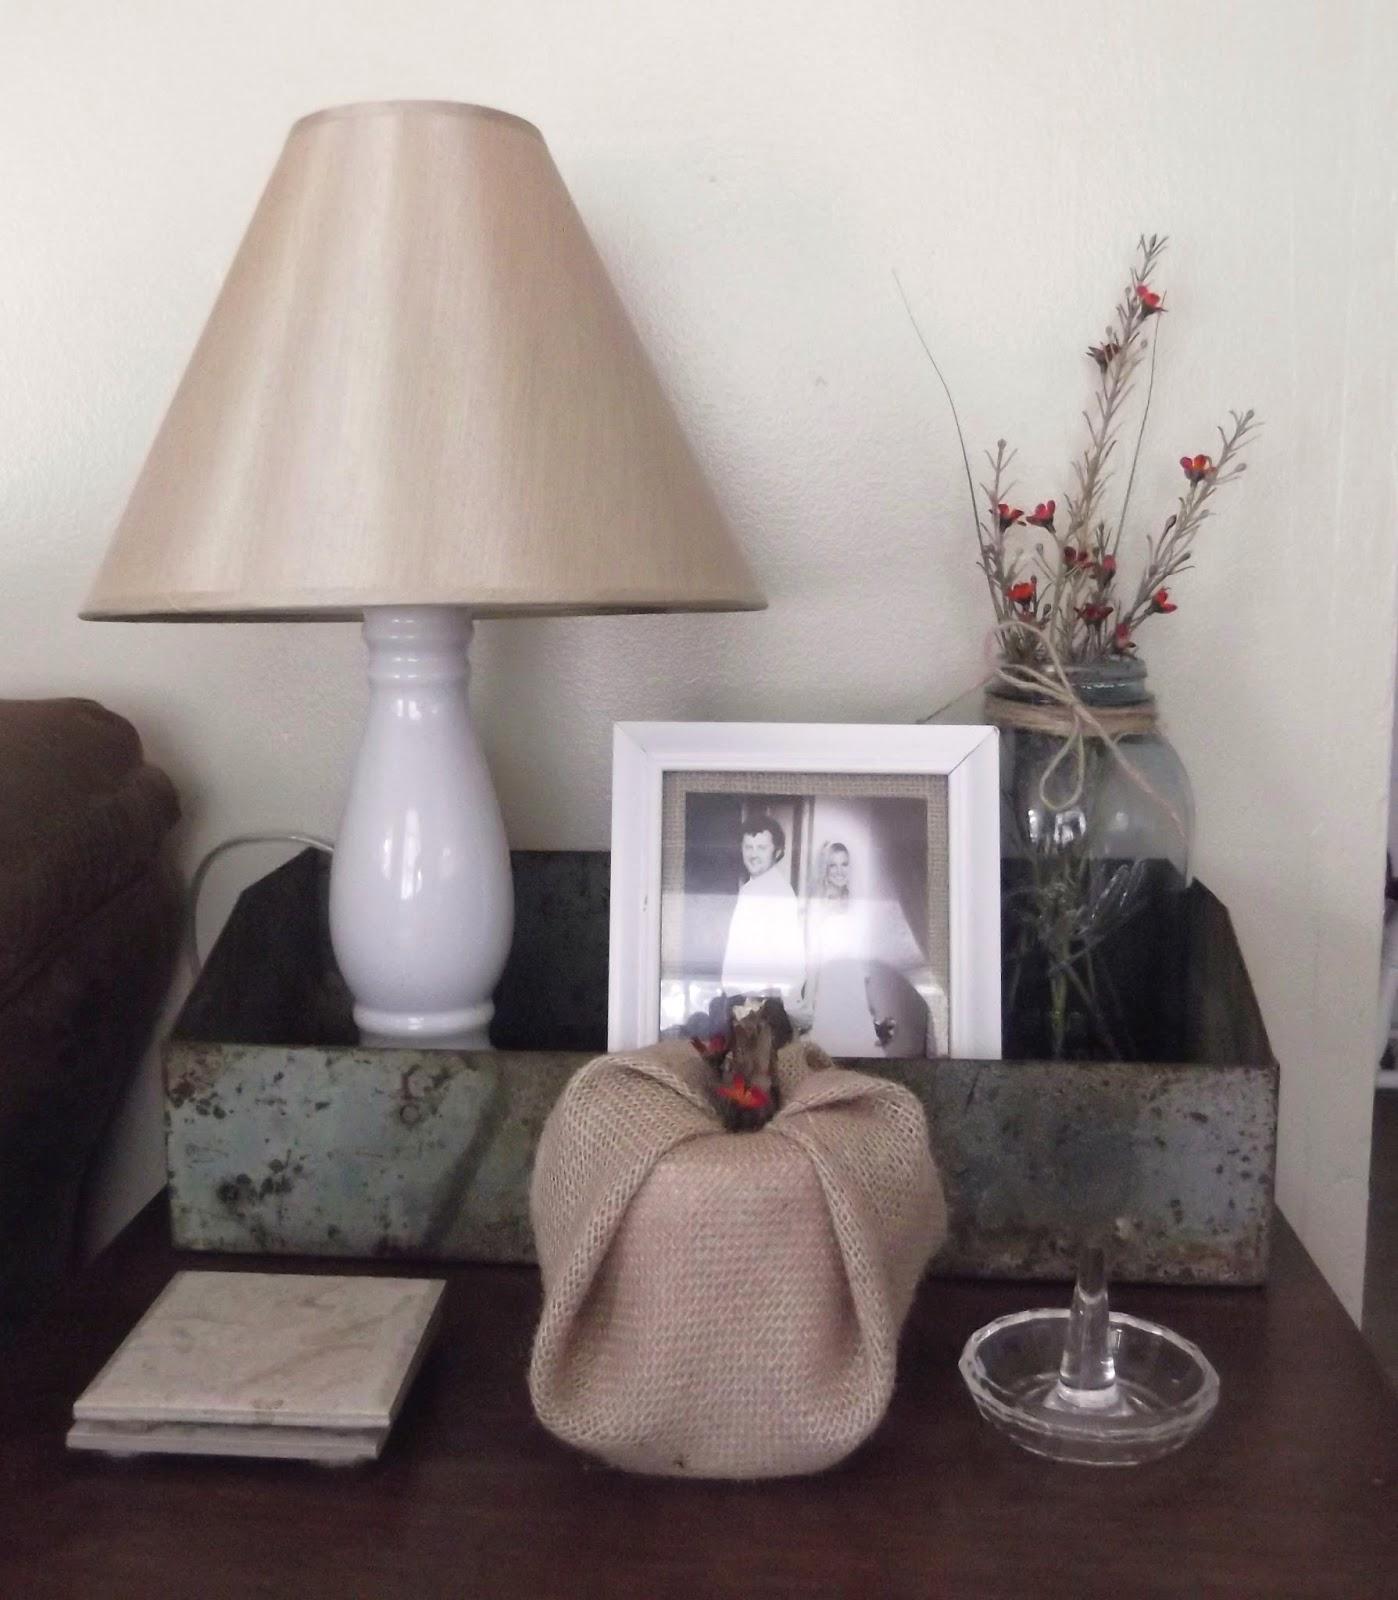 Thrifty Blogs On Home Decor: Thrifty 31 Blog: Fall Decor